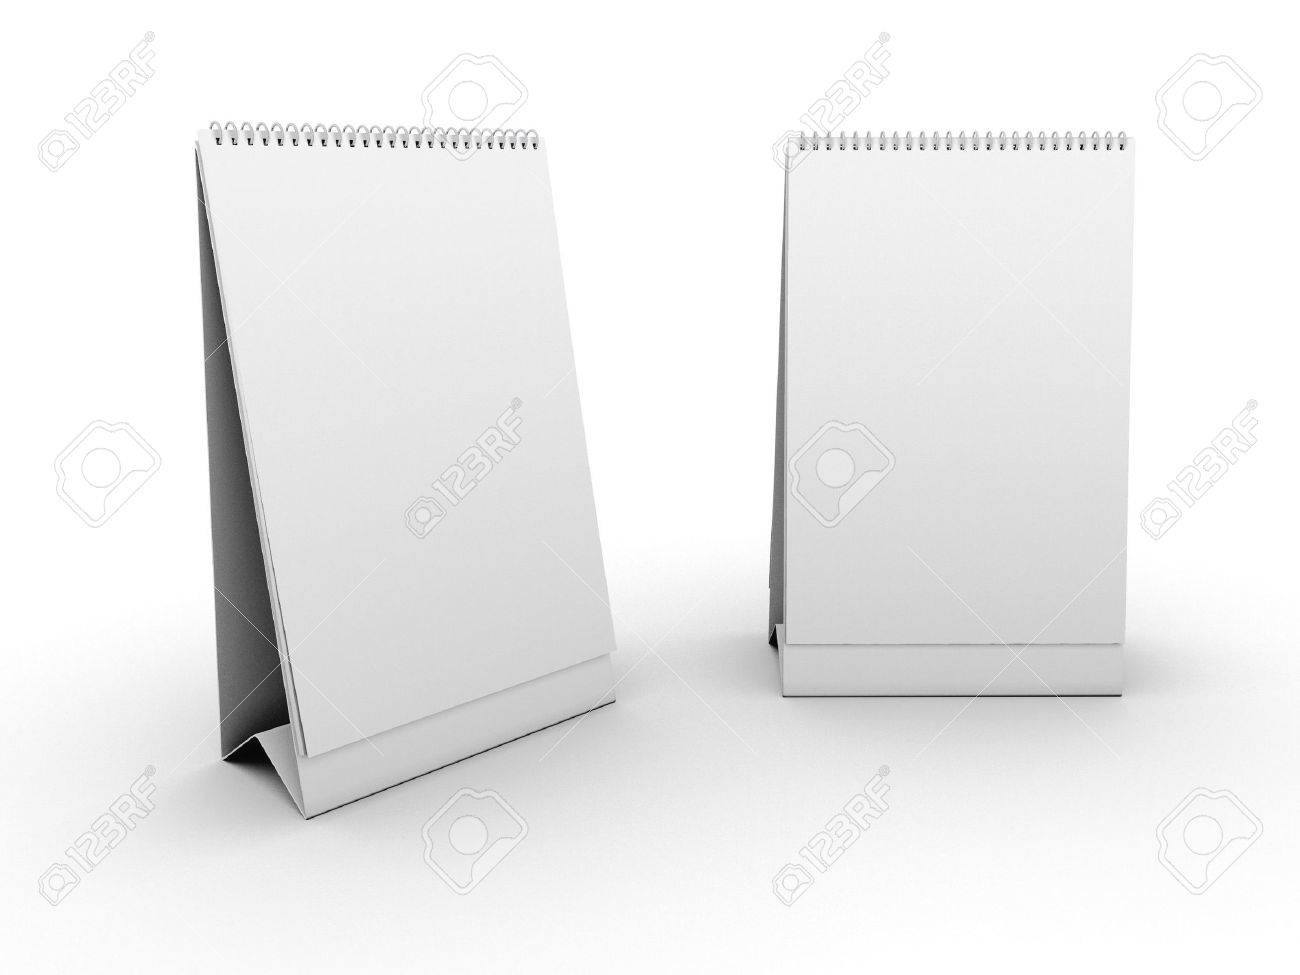 Empty table calendar template Standard-Bild - 5277104